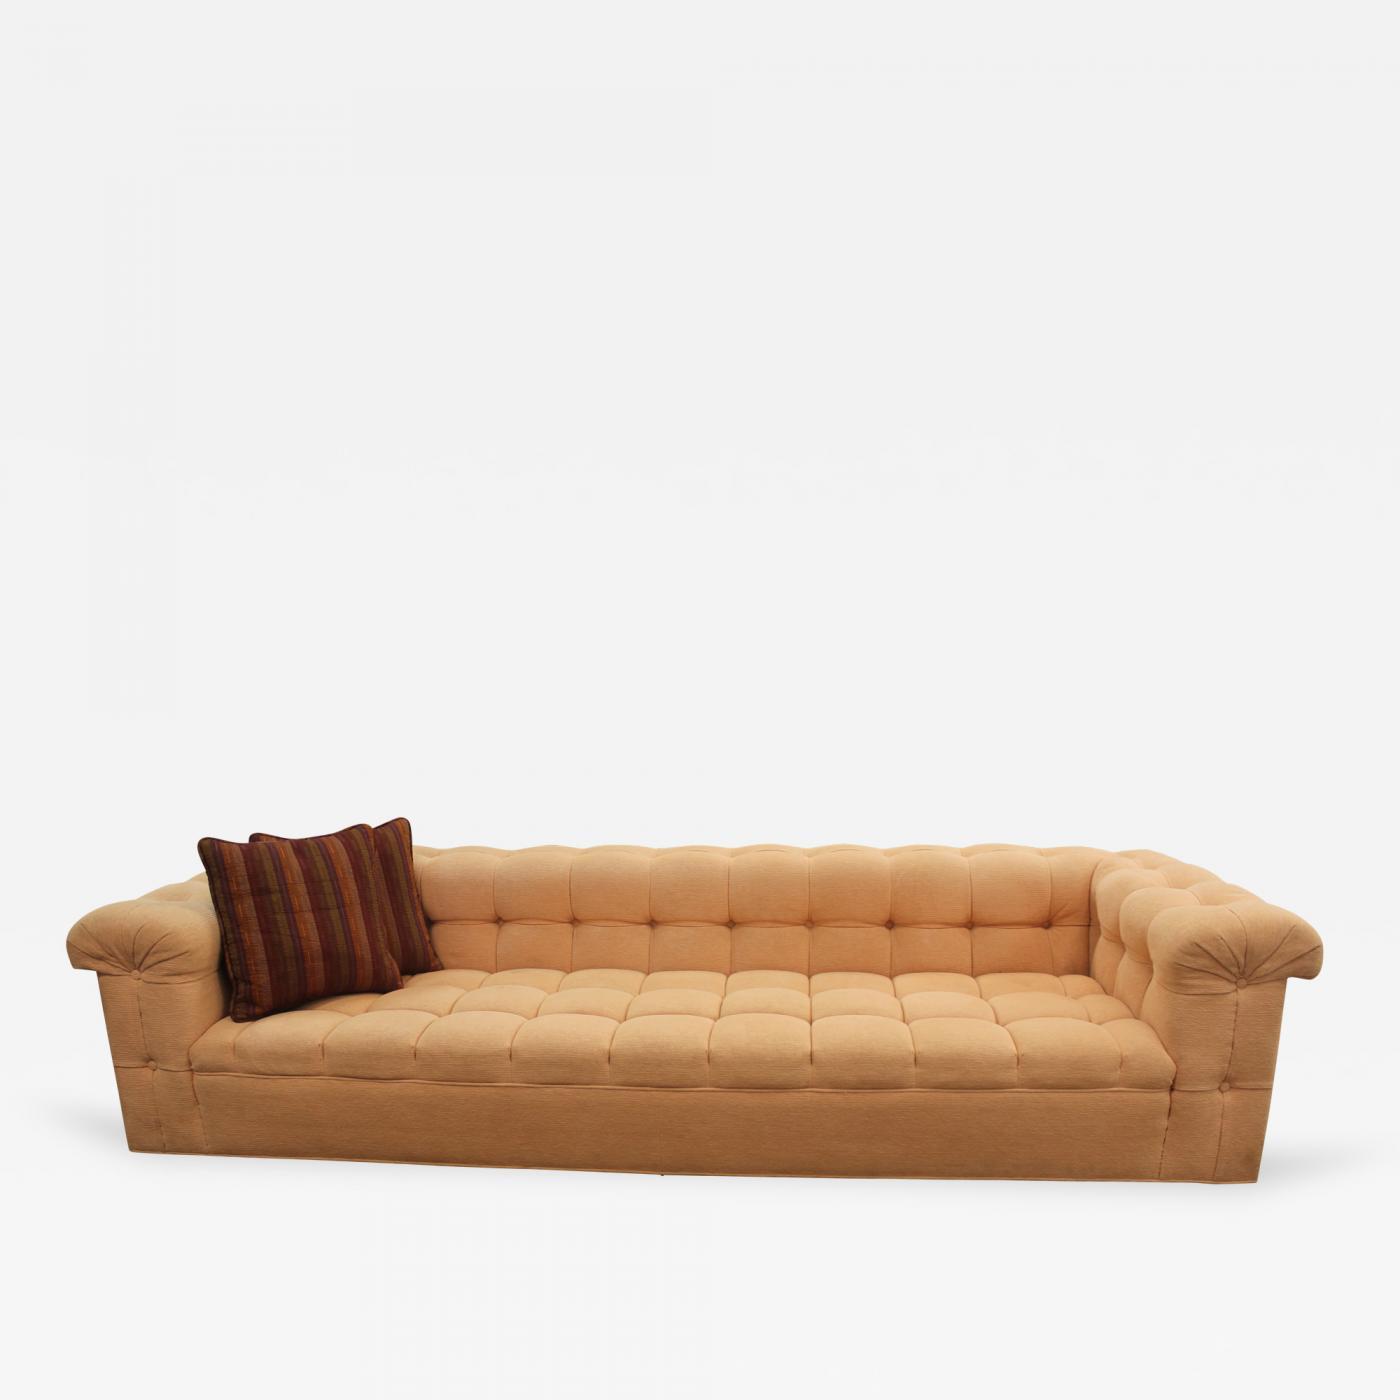 Listings / Furniture / Seating / Sofas · Edward Wormley ...